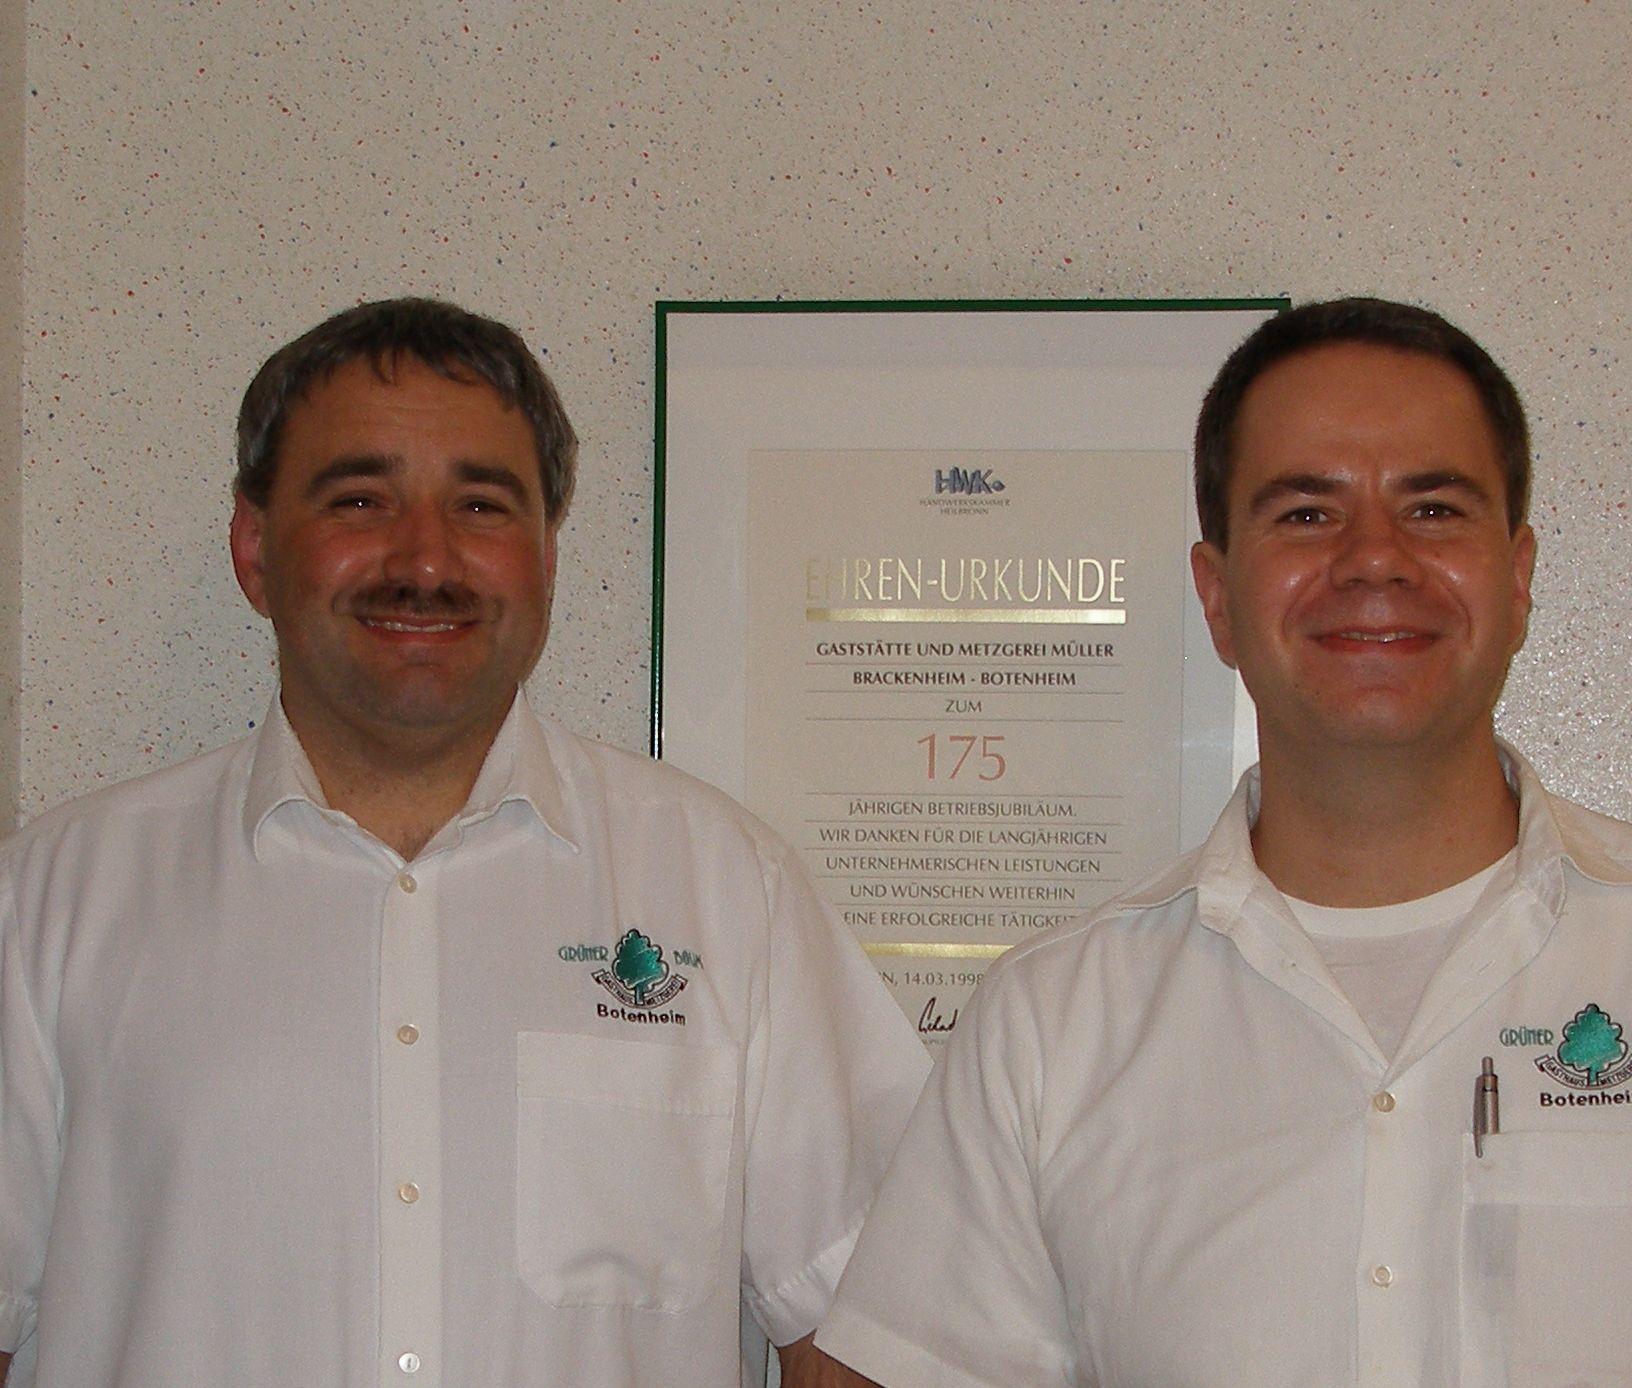 Grüner Baum - Bernd und Ralf Müller